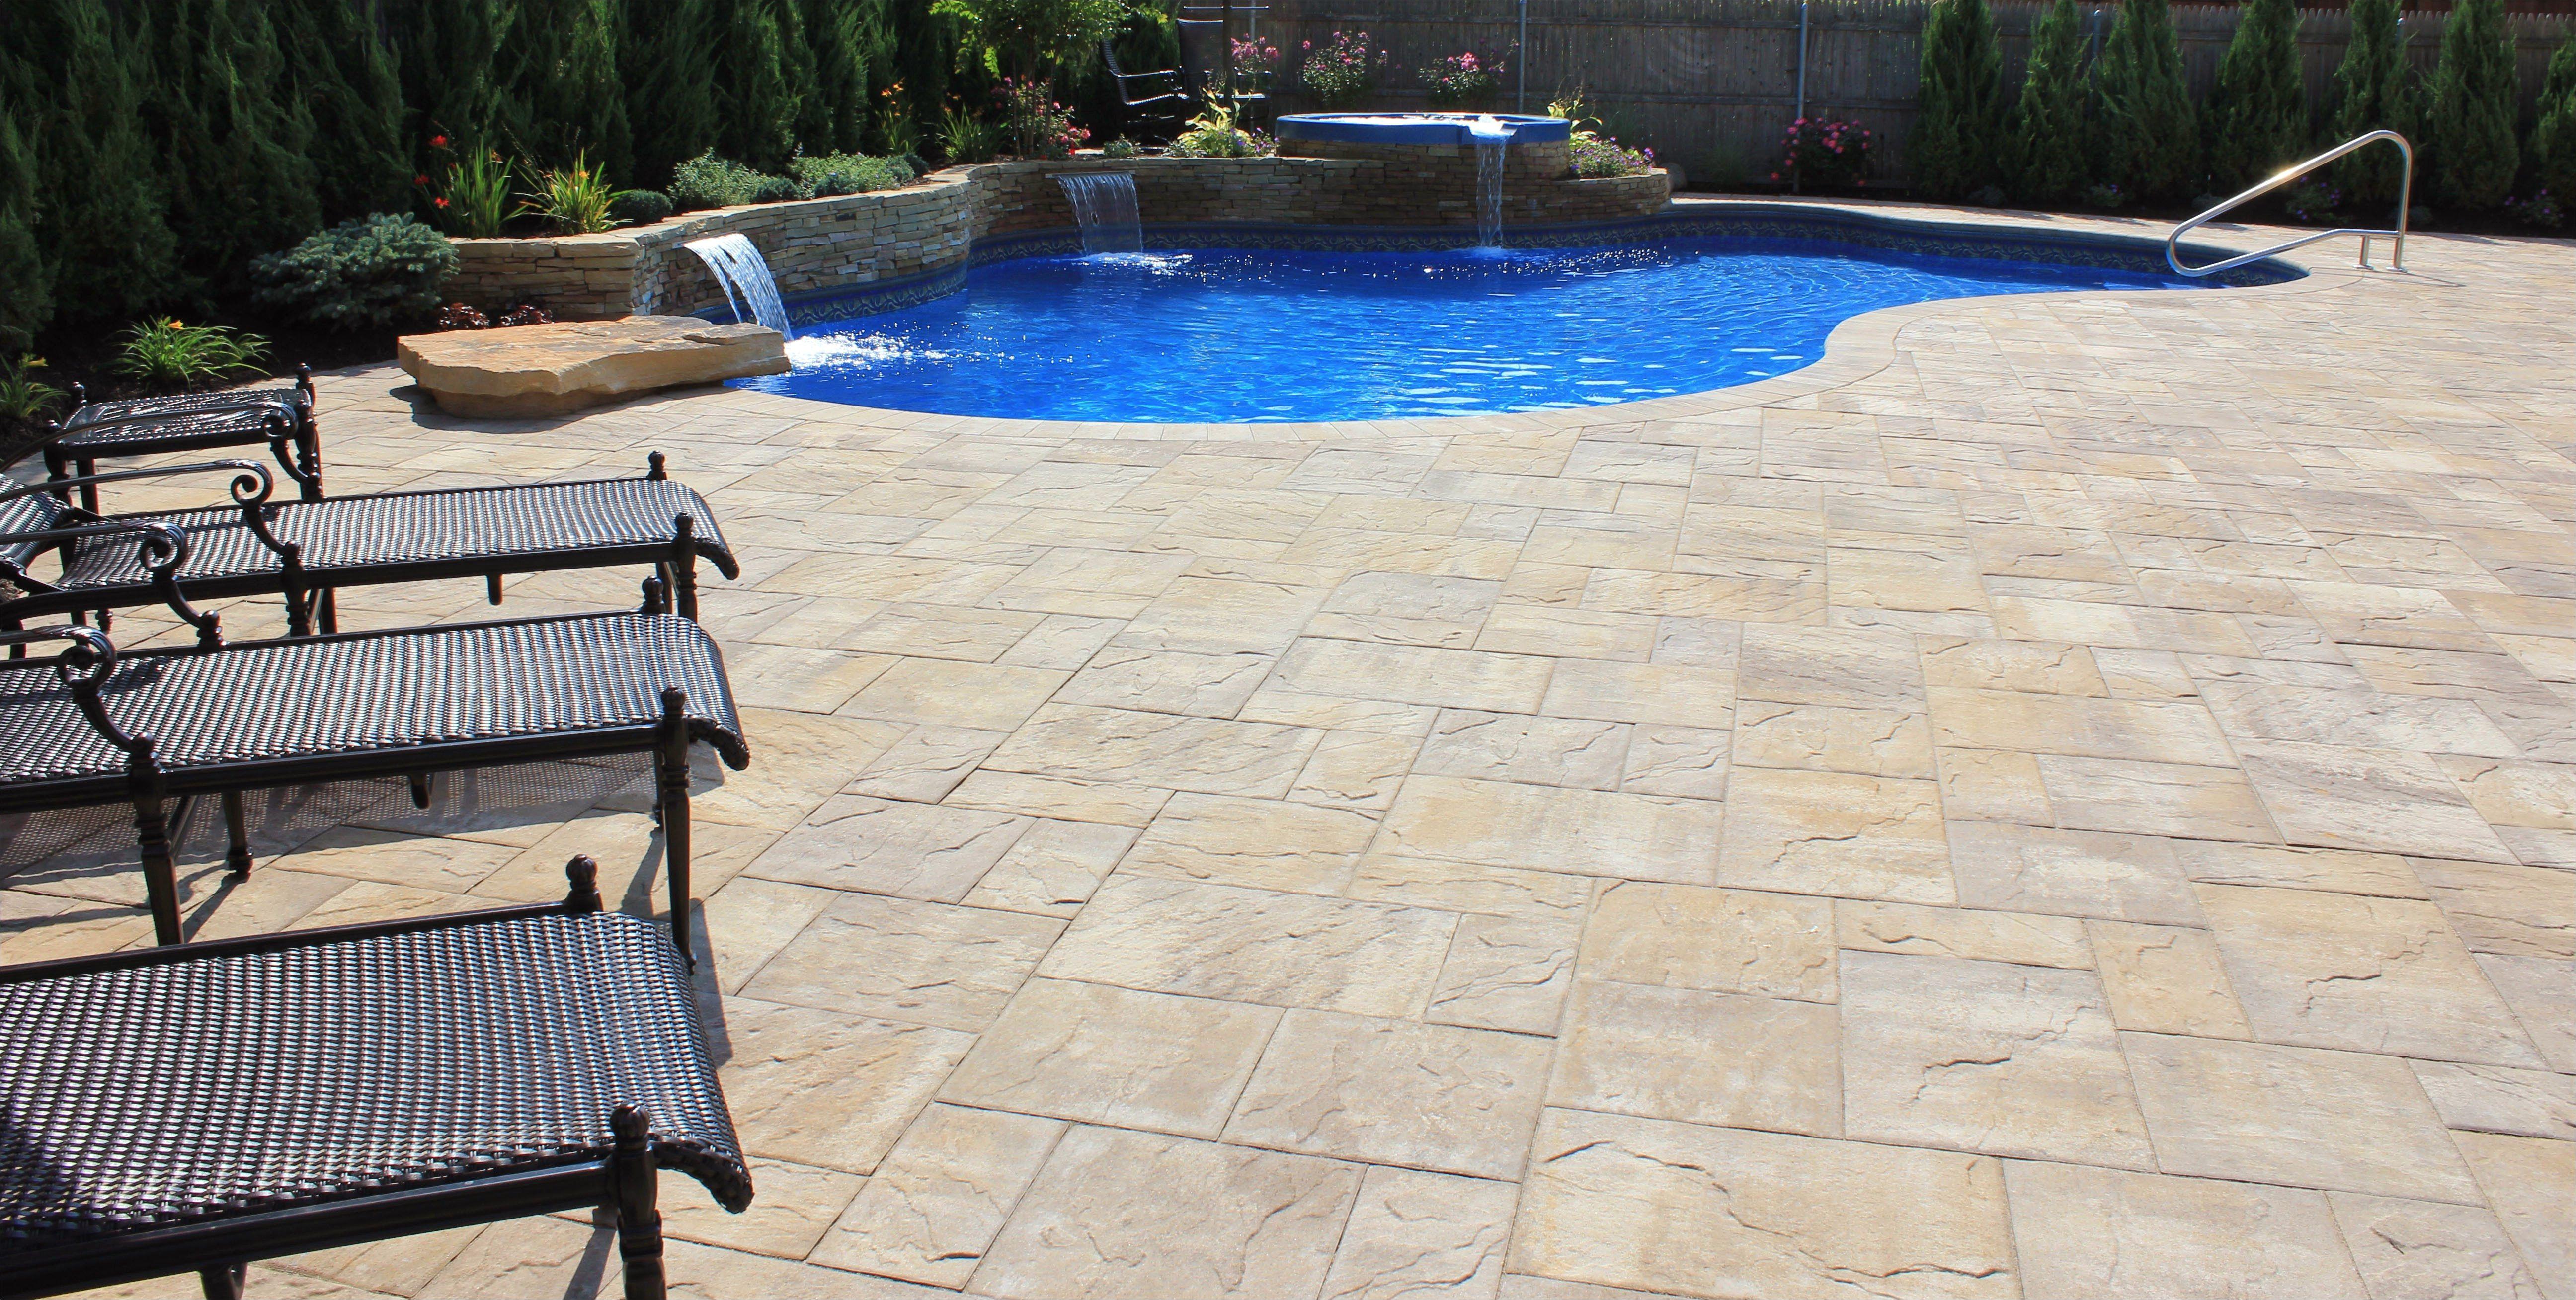 cambridge ledgestone xl sahara chestnut lite paver pool patio merrick long island ny